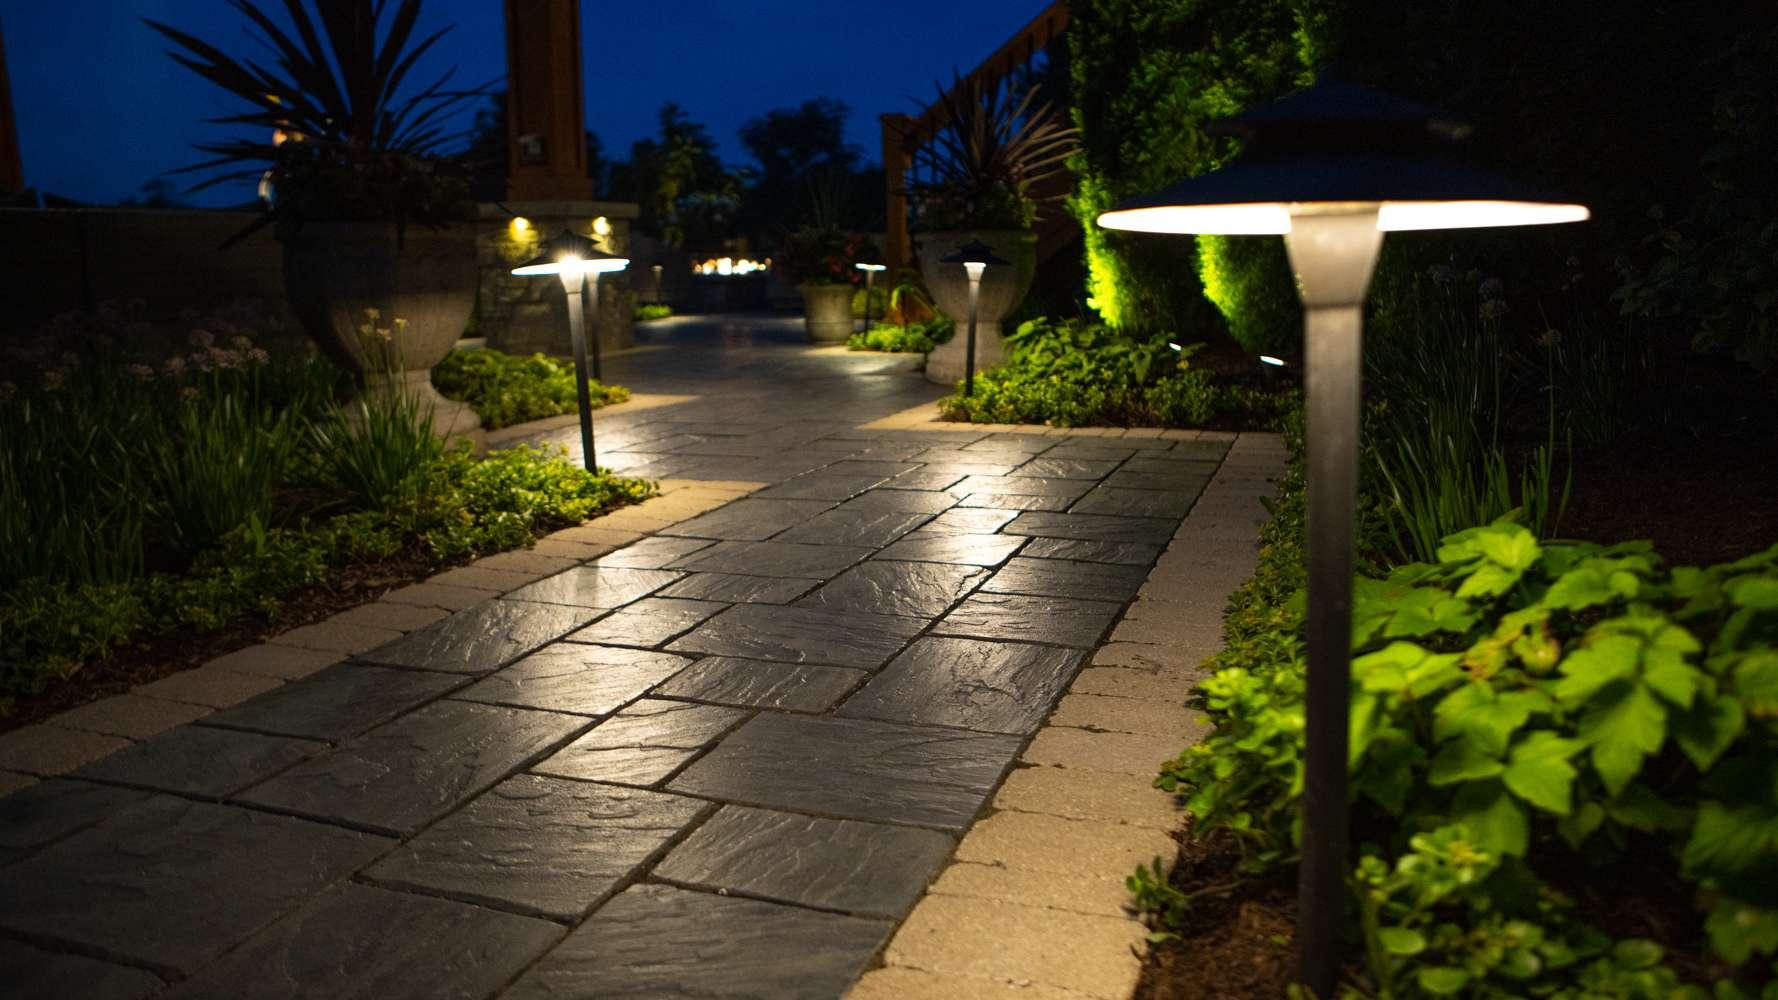 Glare shields on pathway lighting